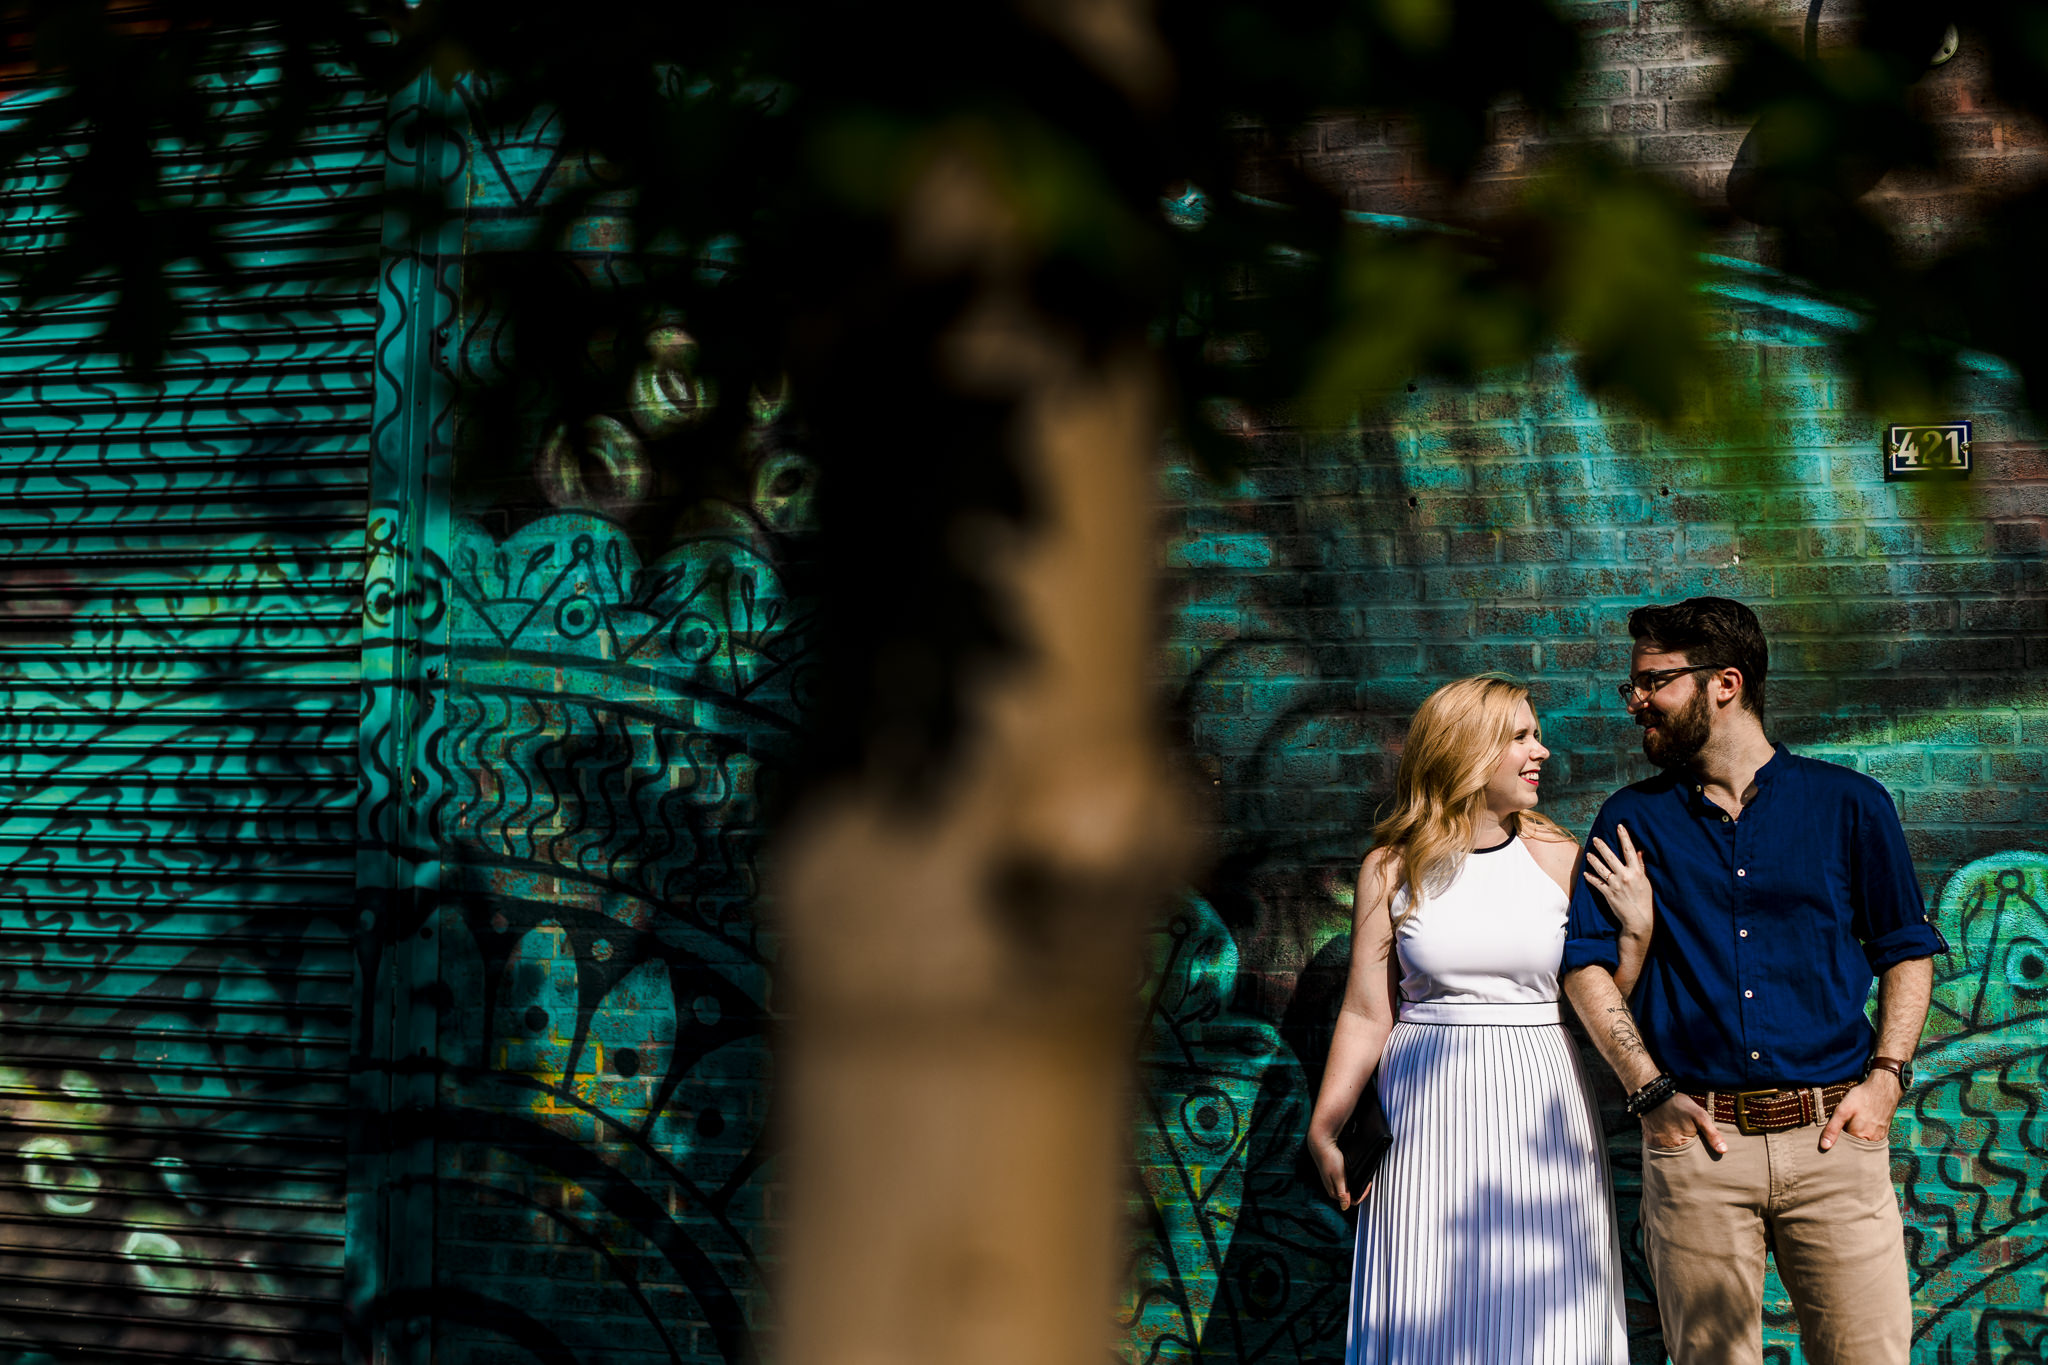 Arena-Brooklyn-New-York-Engagement-Photos-02.jpg